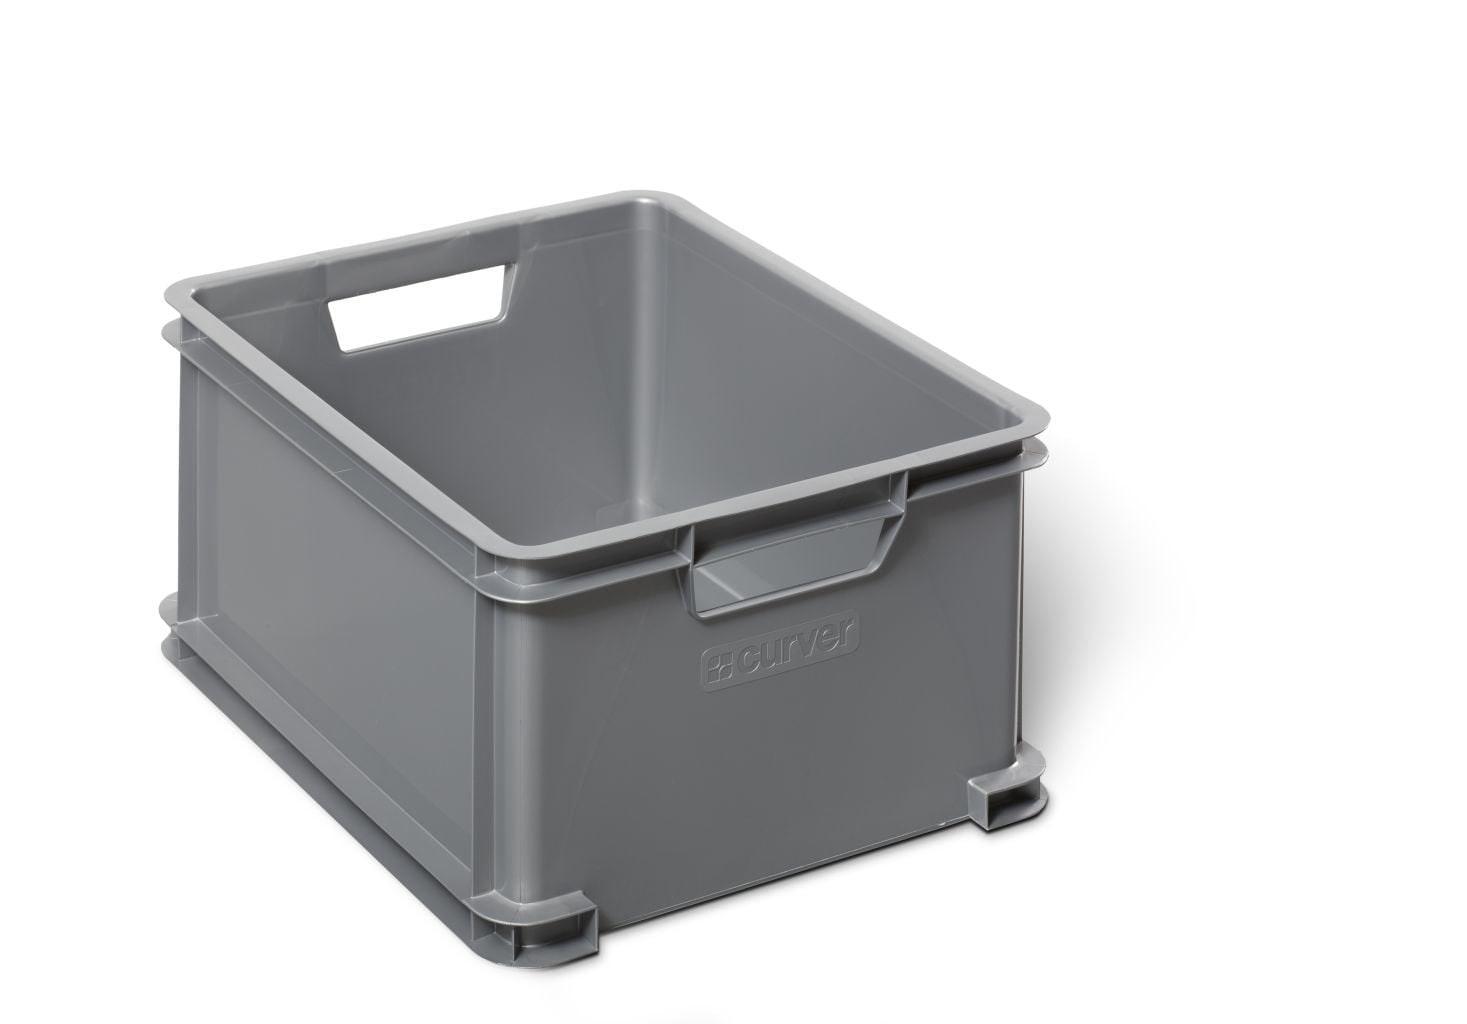 Curver unibox classic L